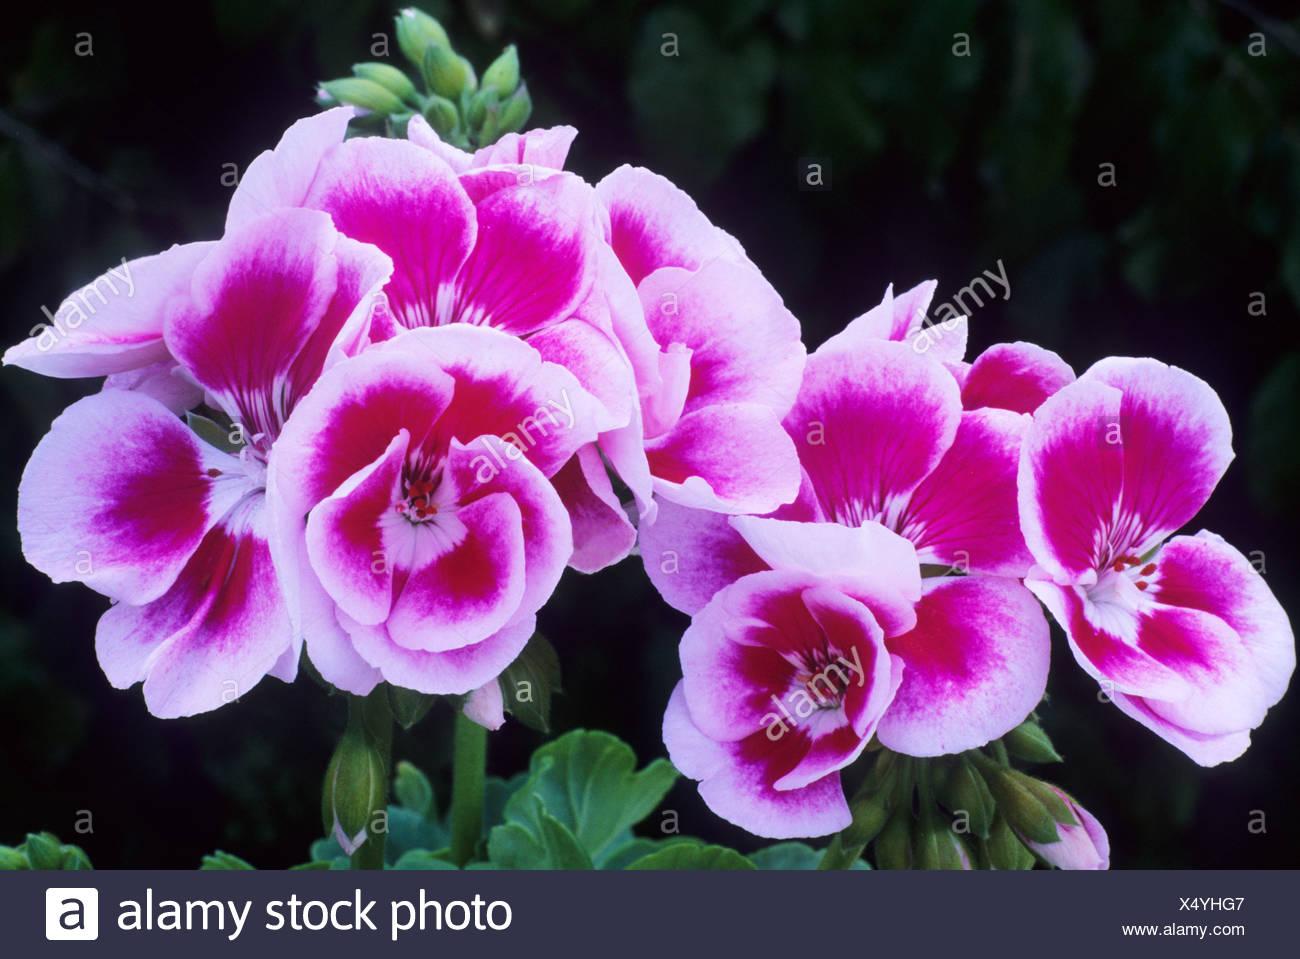 Pelargonium Flower Fairy White Splash Pink And White Flower